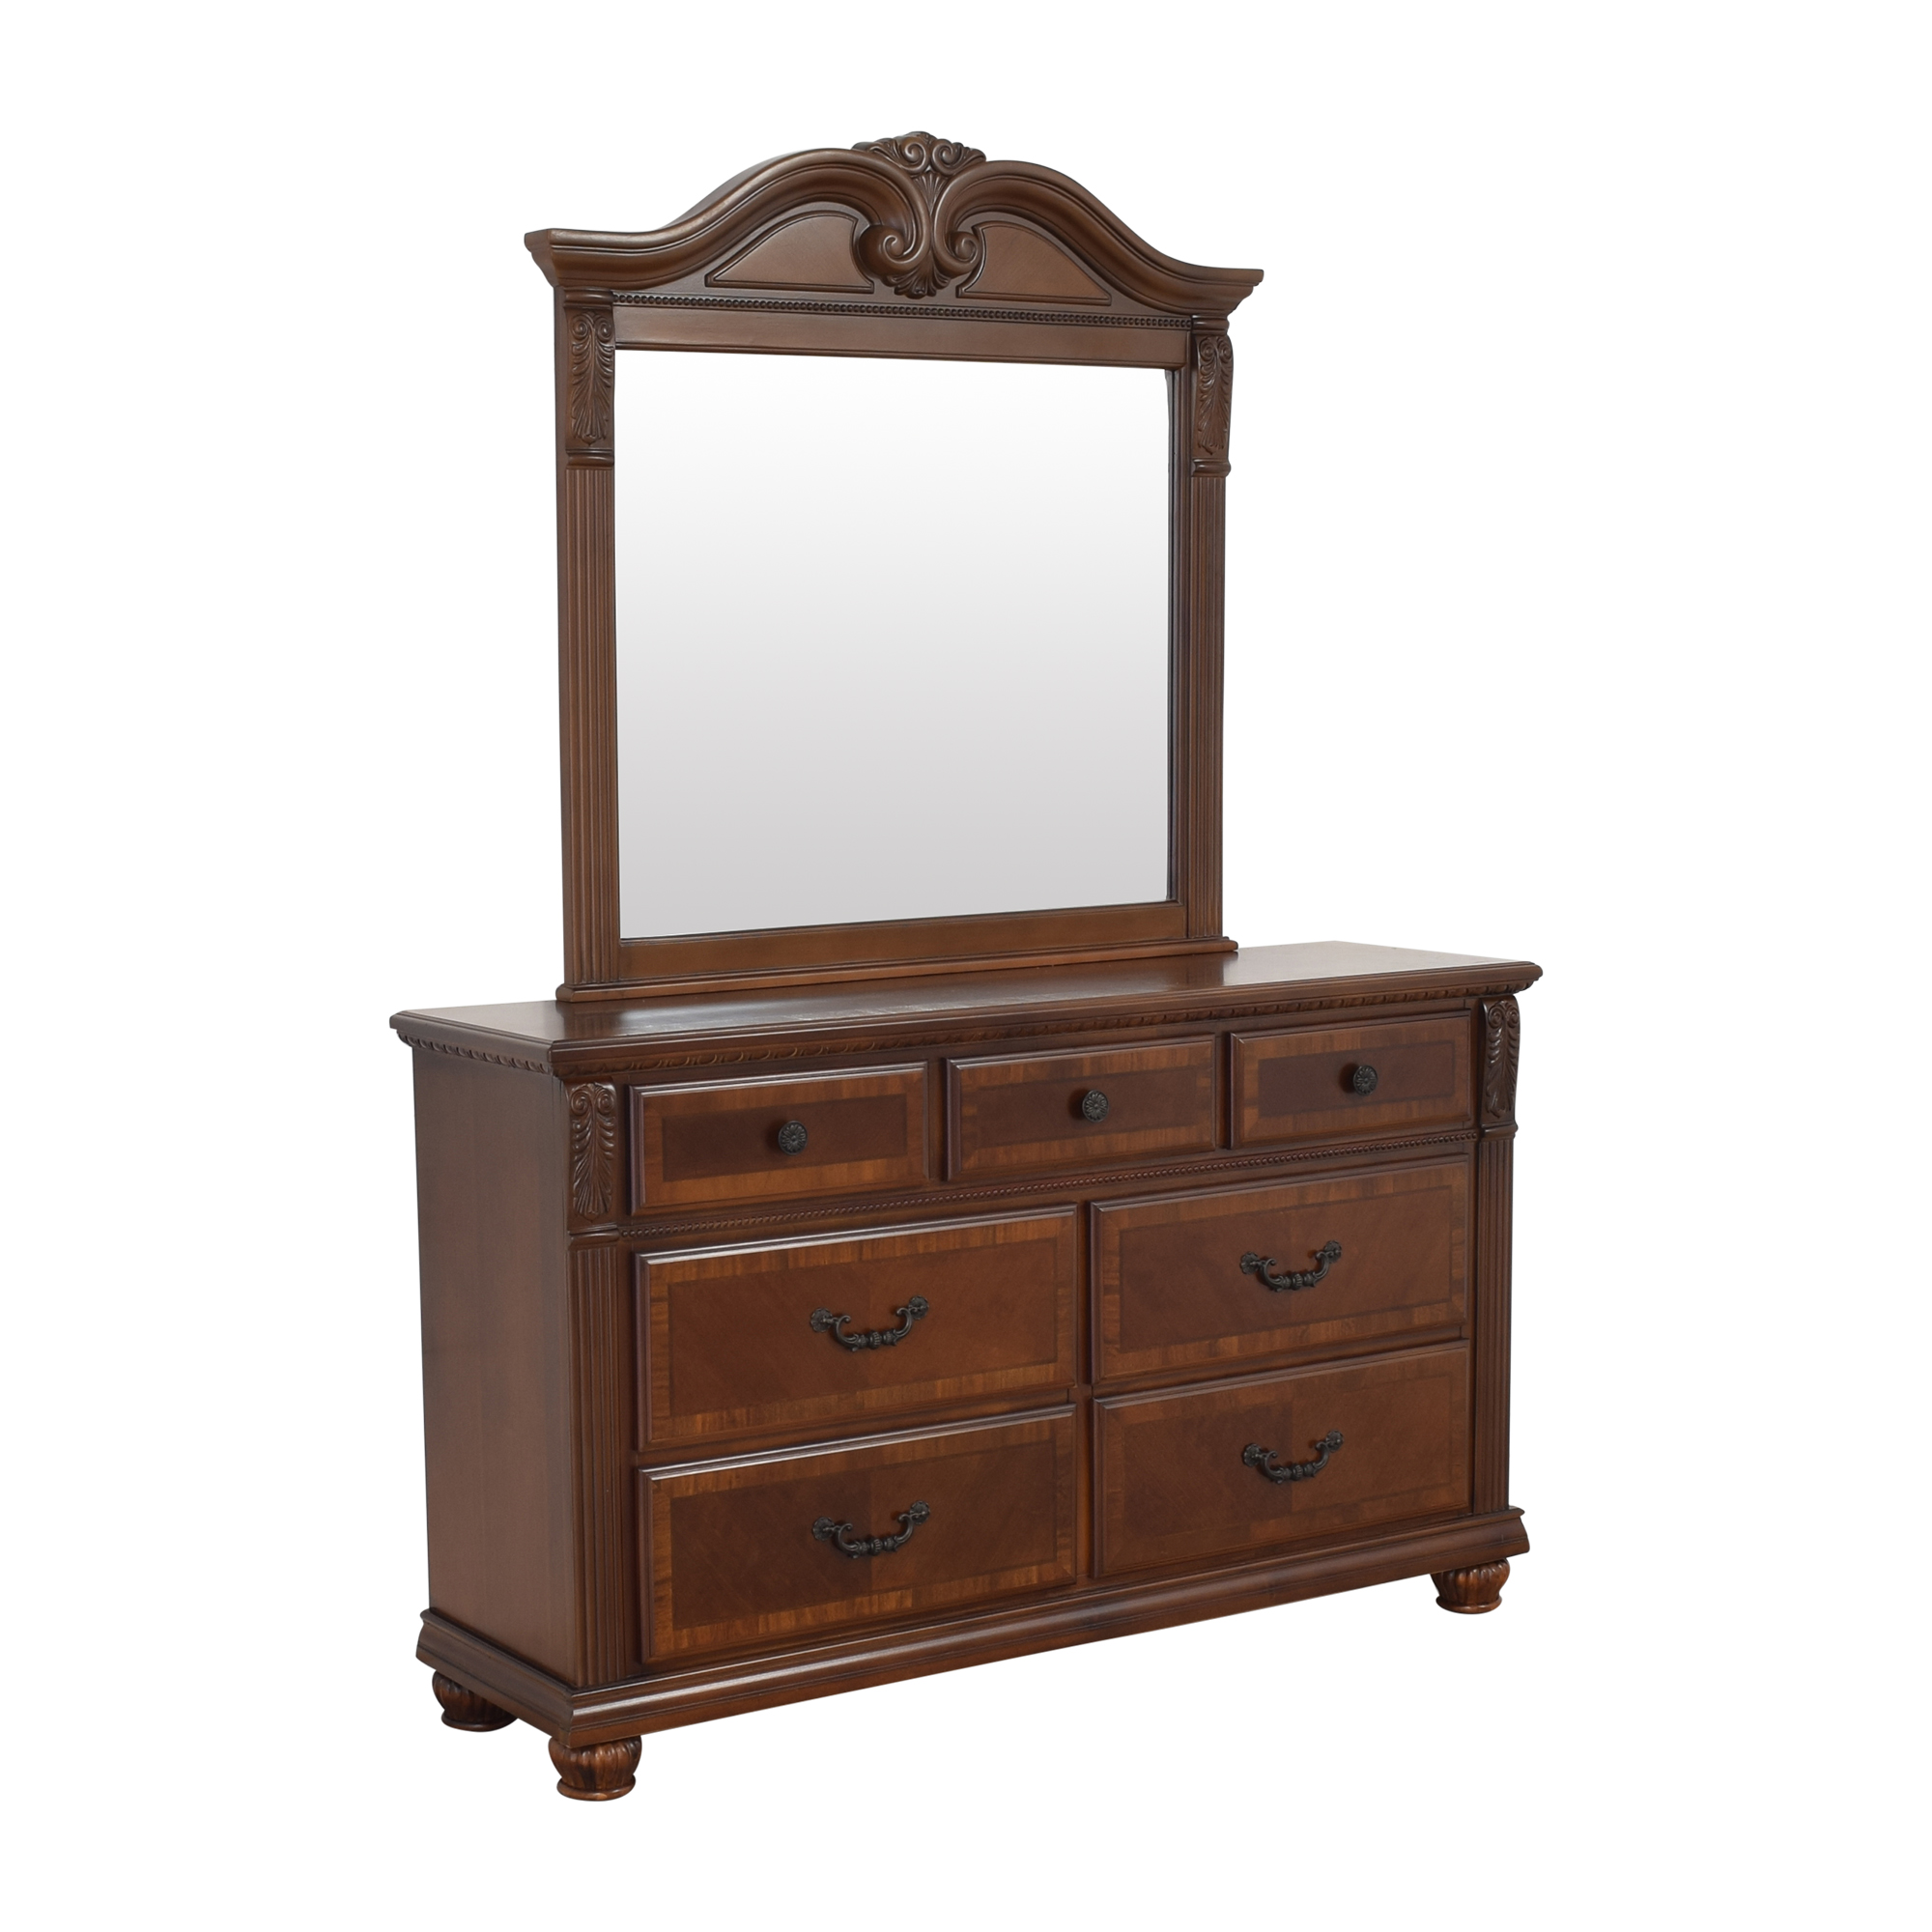 Raymour & Flanigan Ashbury Dresser with Mirror / Storage